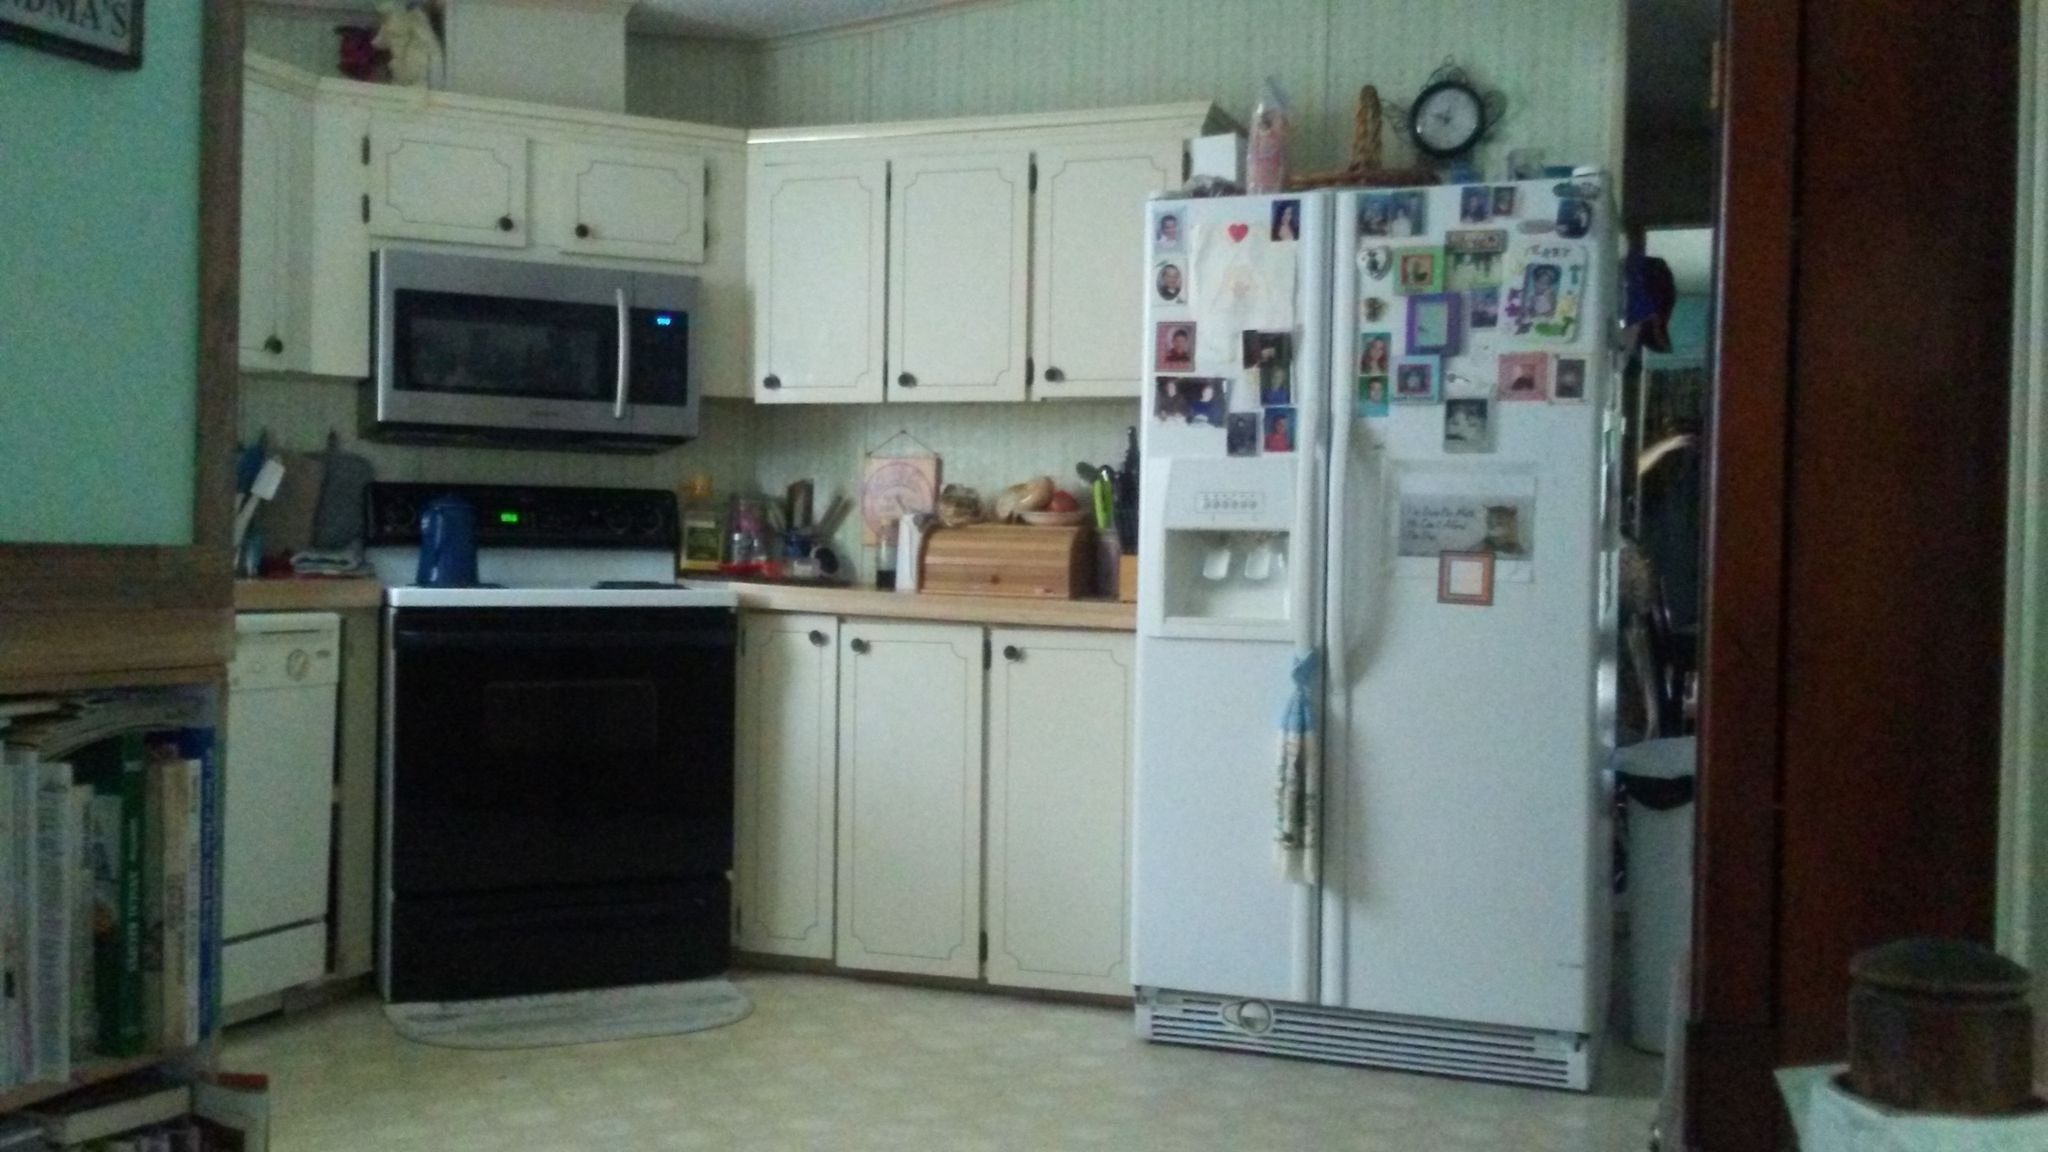 9 Ohara Dr, Haines City, FL 33844 - Estimate and Home Details   Trulia